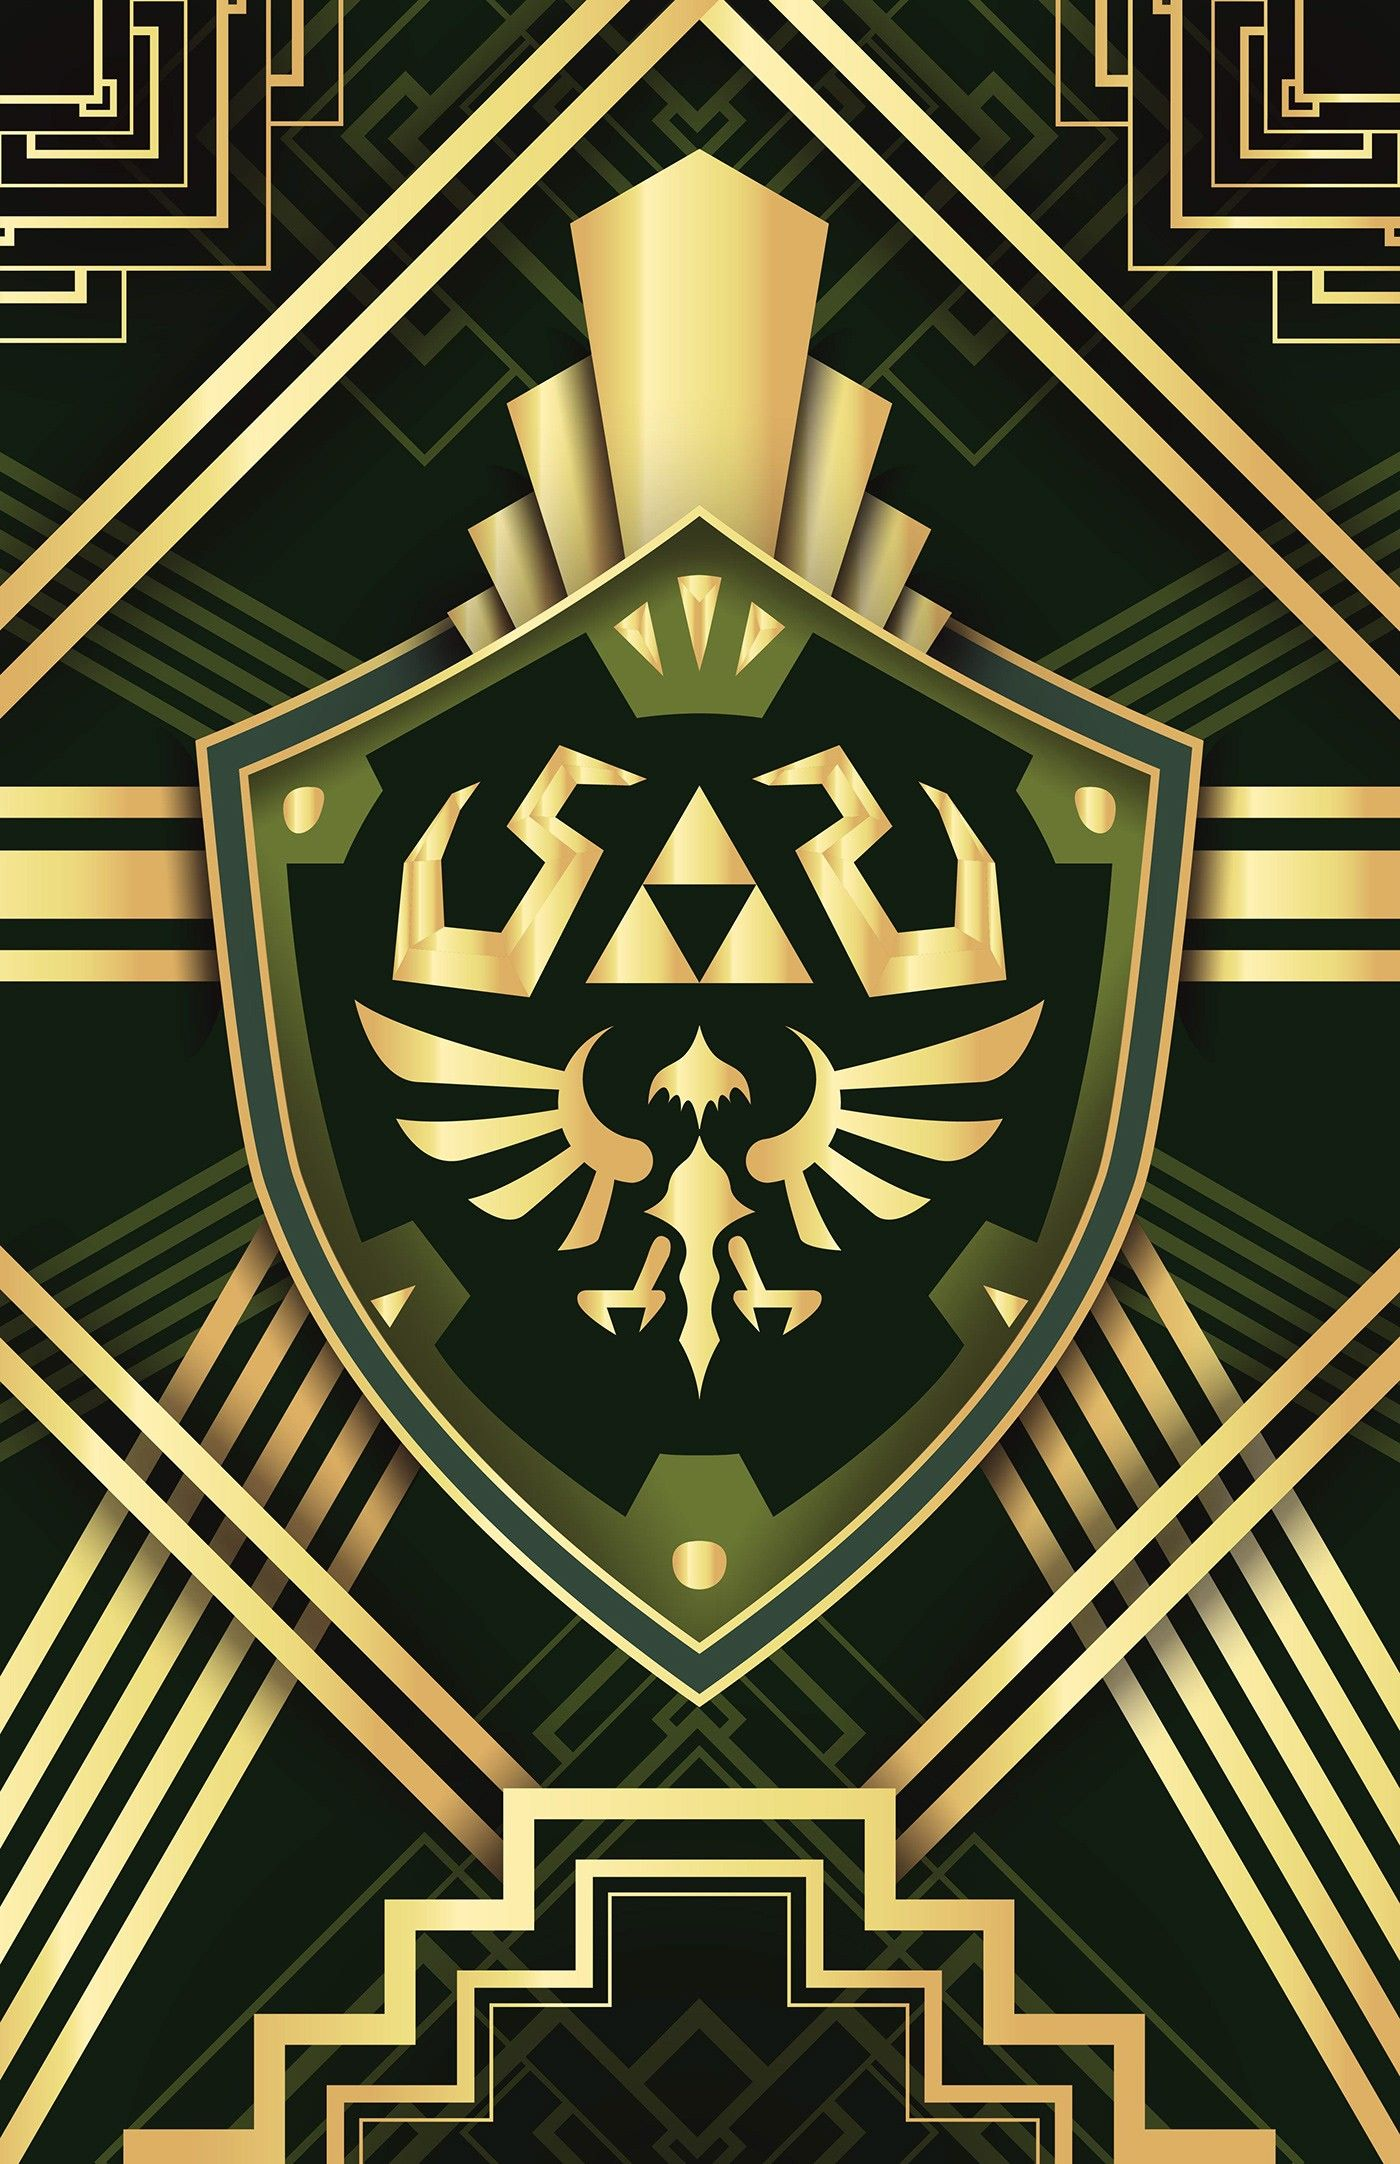 The Legend Of Zelda Hylian Shield Mejores Fondos De Pantalla De Videojuegos Fondos De Pantalla De Juegos Fondos De Pantalla Juegos